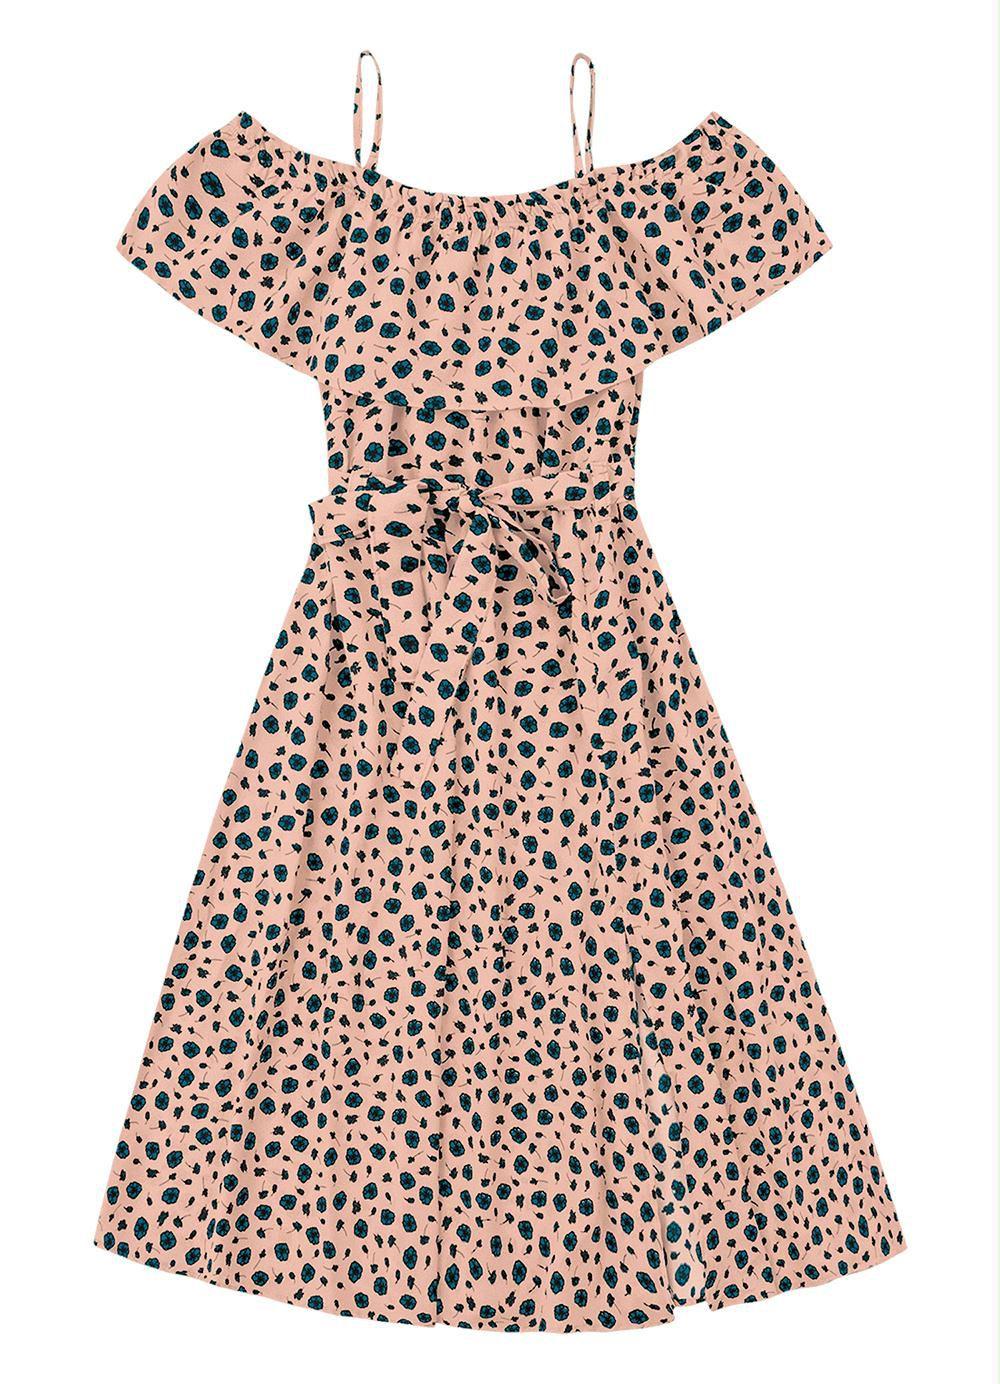 Vestido Rosa Estampado Decote Ombro a Ombro